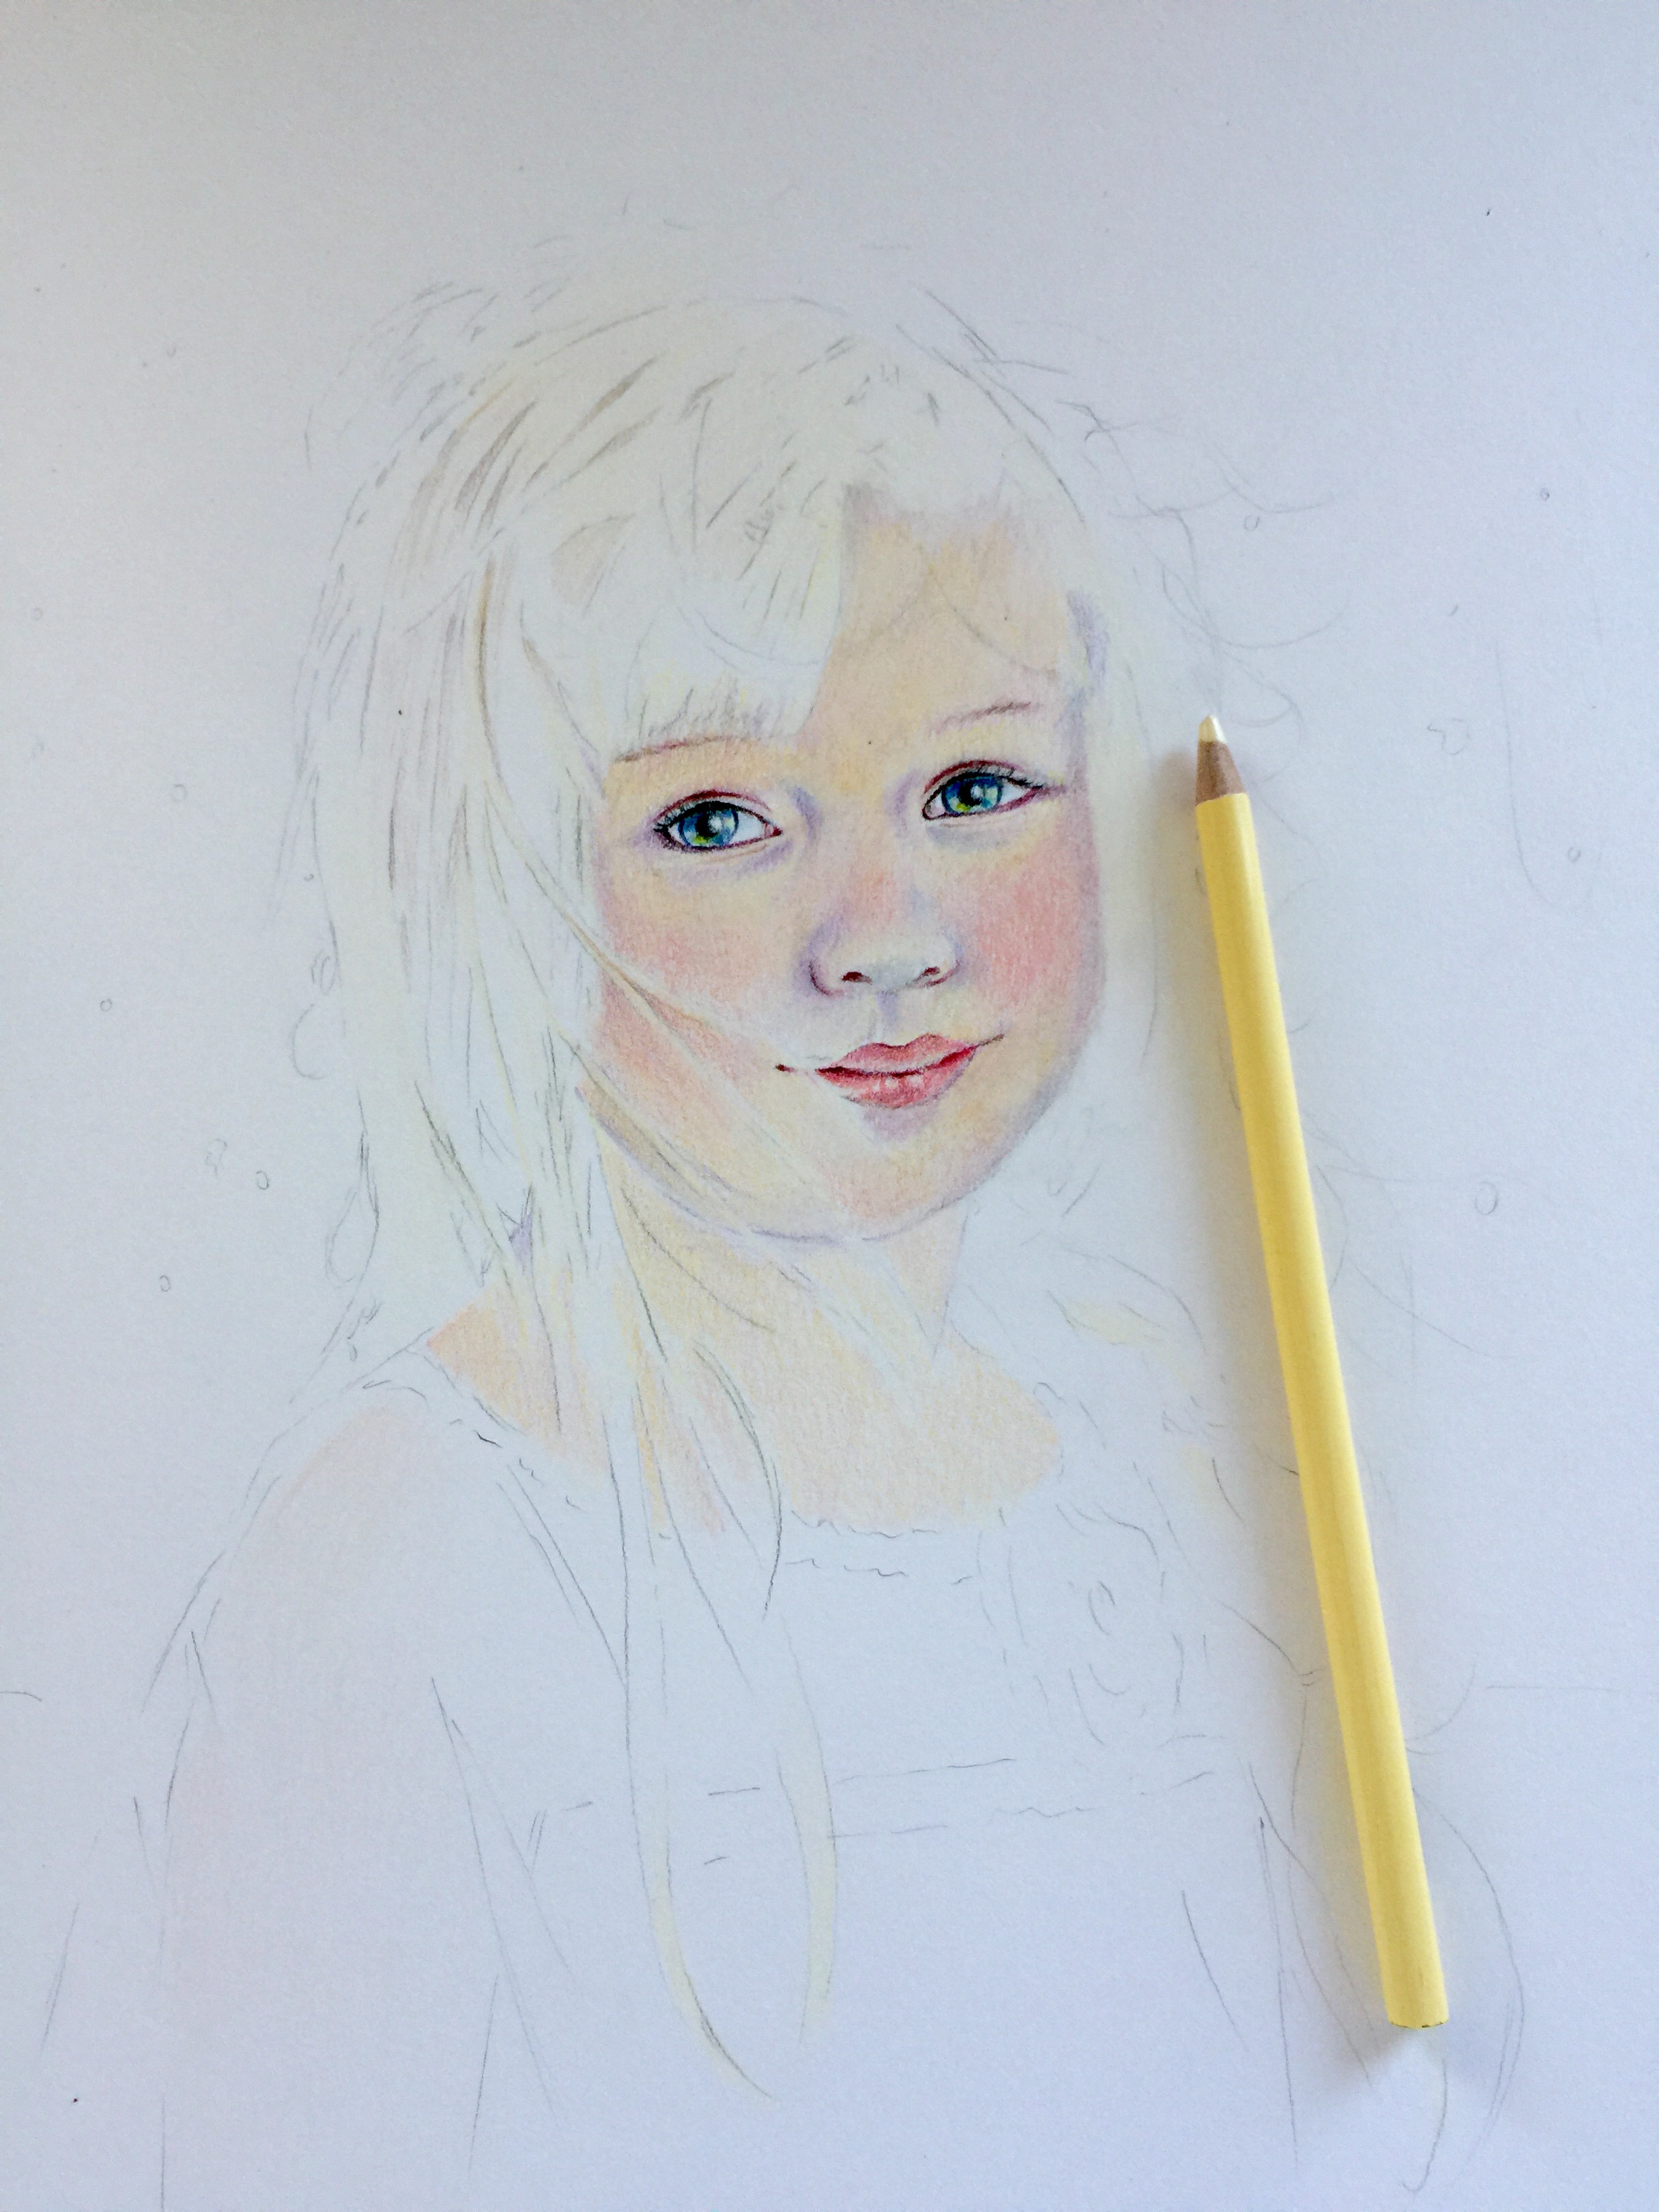 Adding flesh tones to a colored pencil portrait